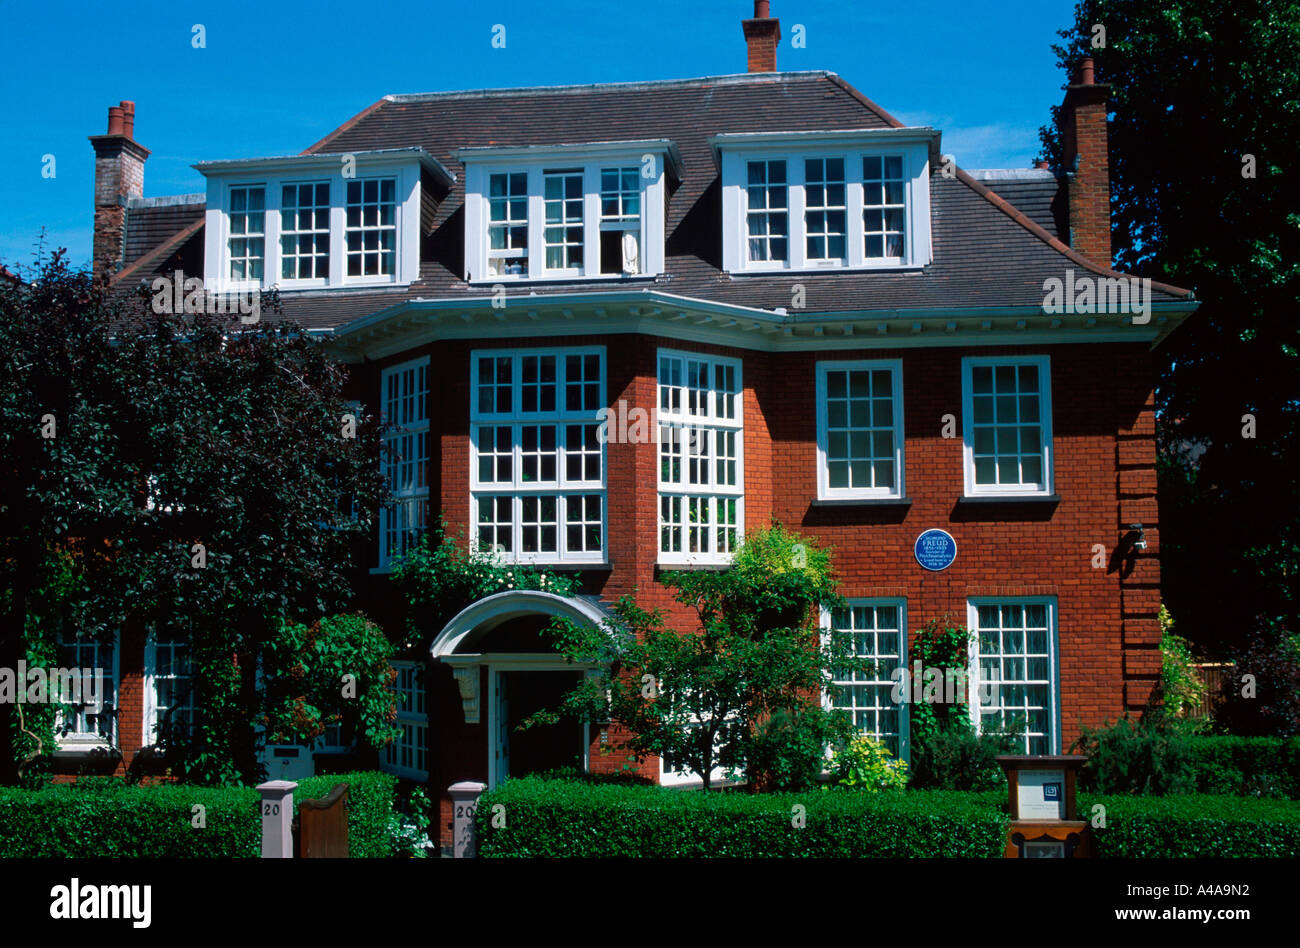 Sigmund Freud House / London - Stock Image